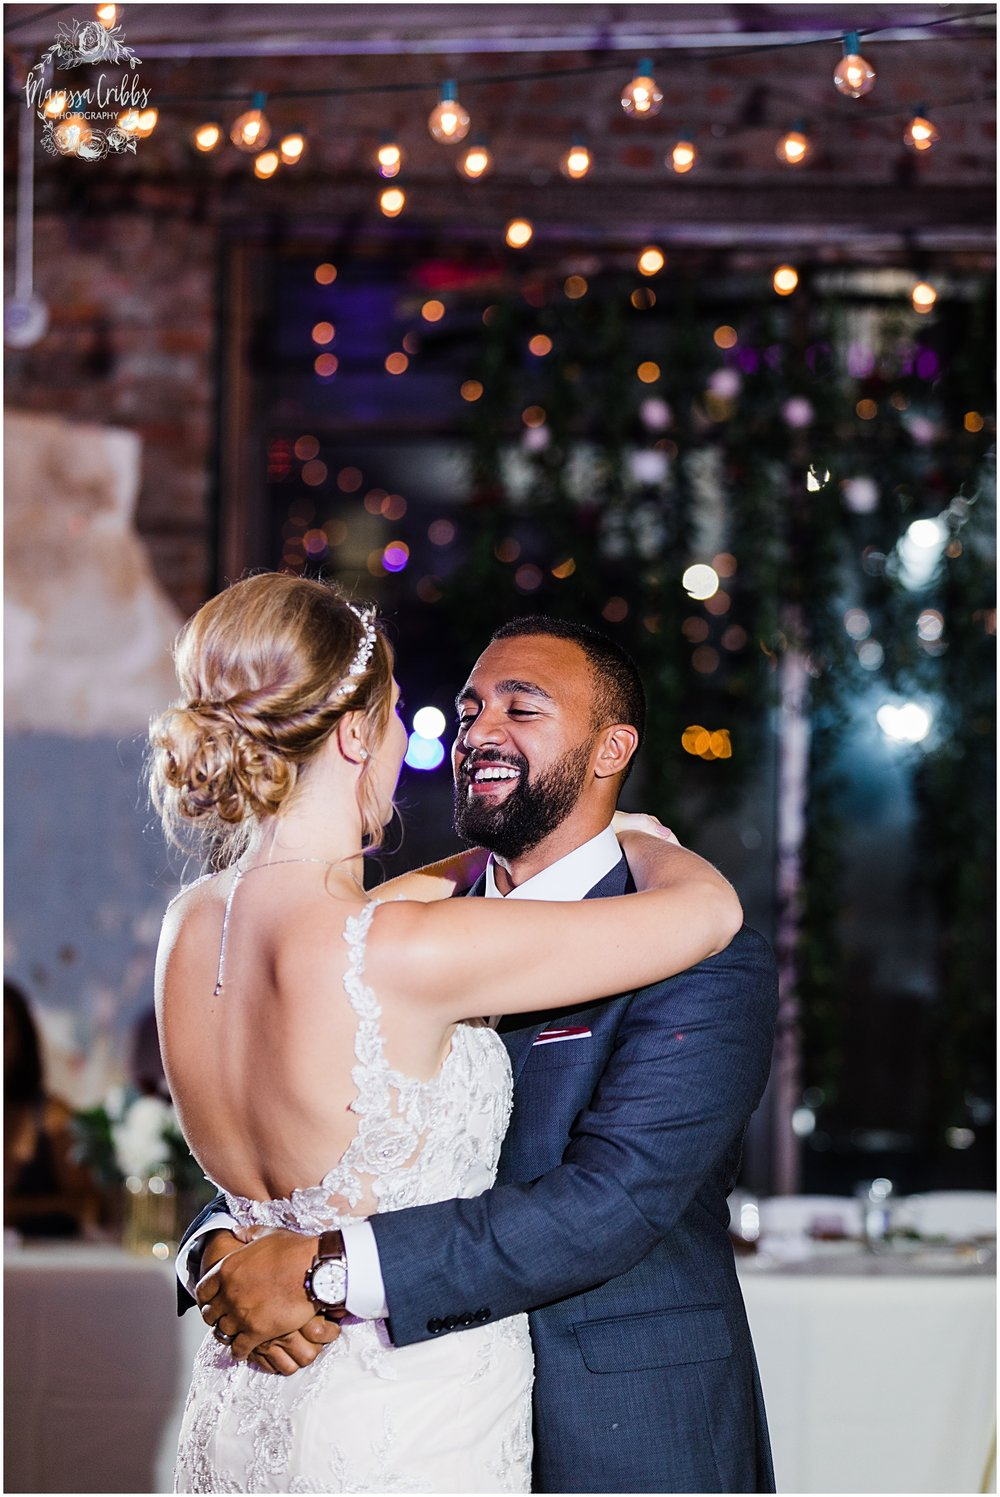 BAUER WEDDING | KELSEA & JUSTIN | MARISSA CRIBBS PHOTOGRAPHY_6595.jpg